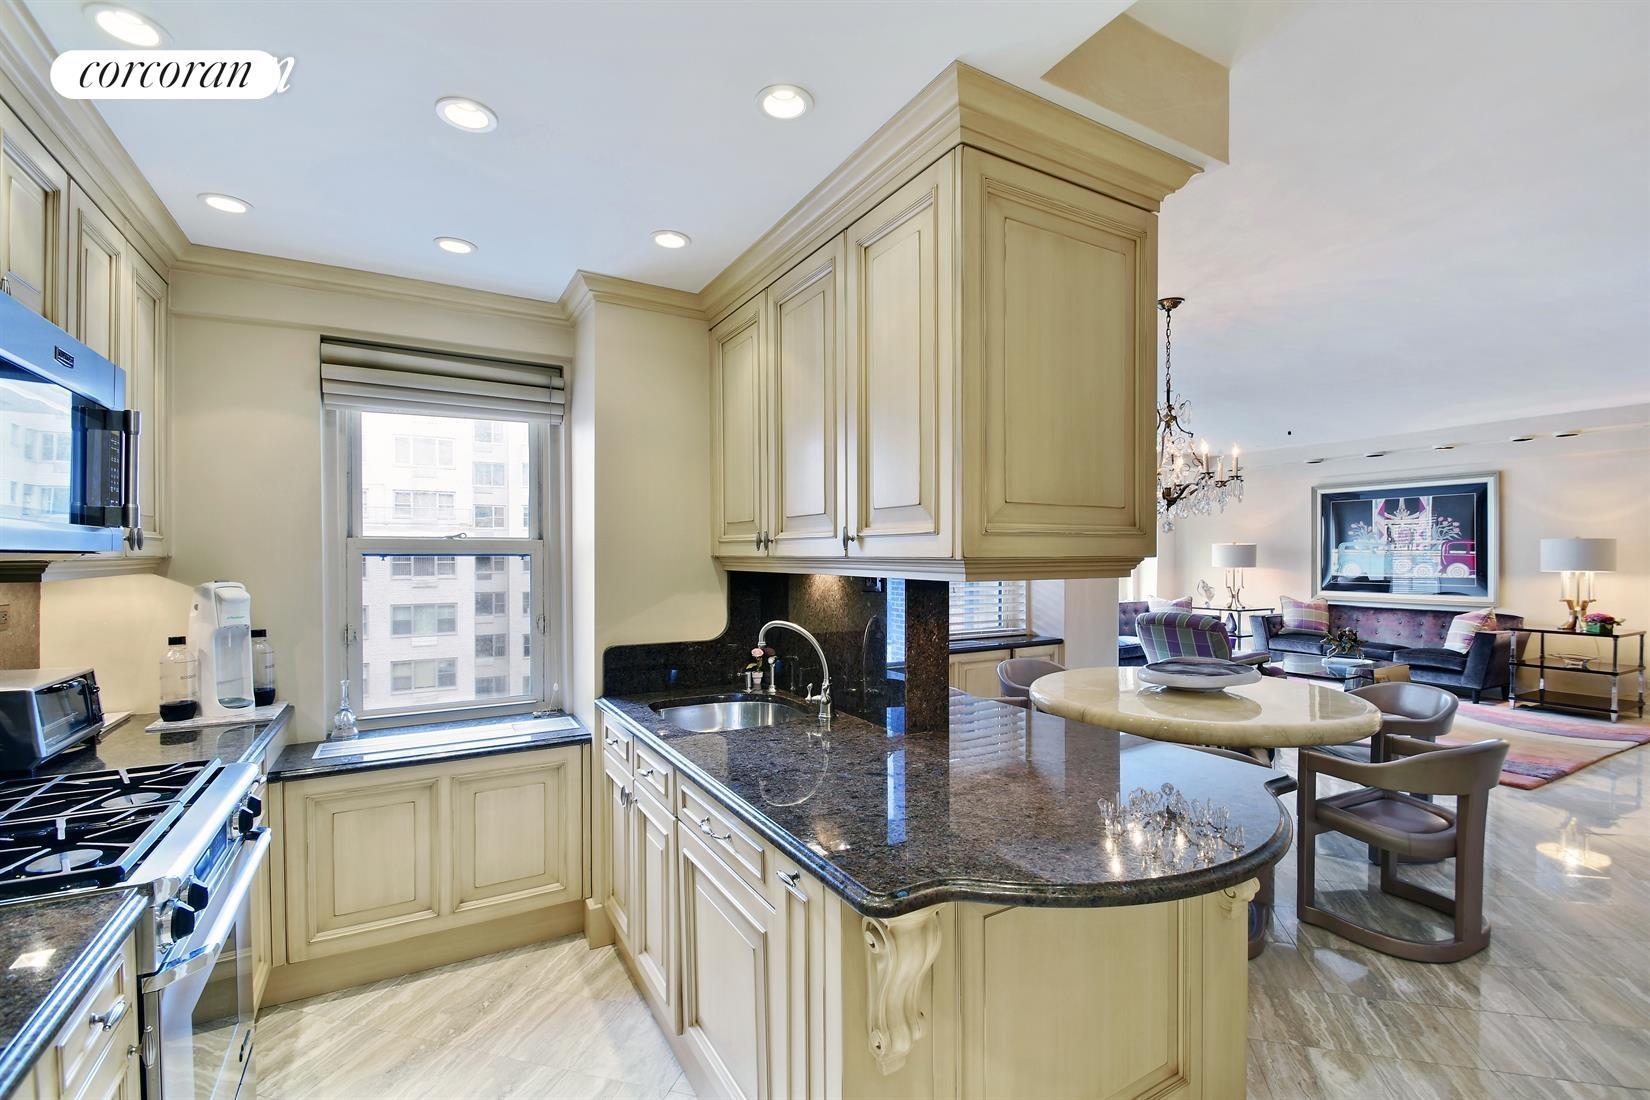 Apartment for sale at 50 Sutton Place South, Apt 18A/B